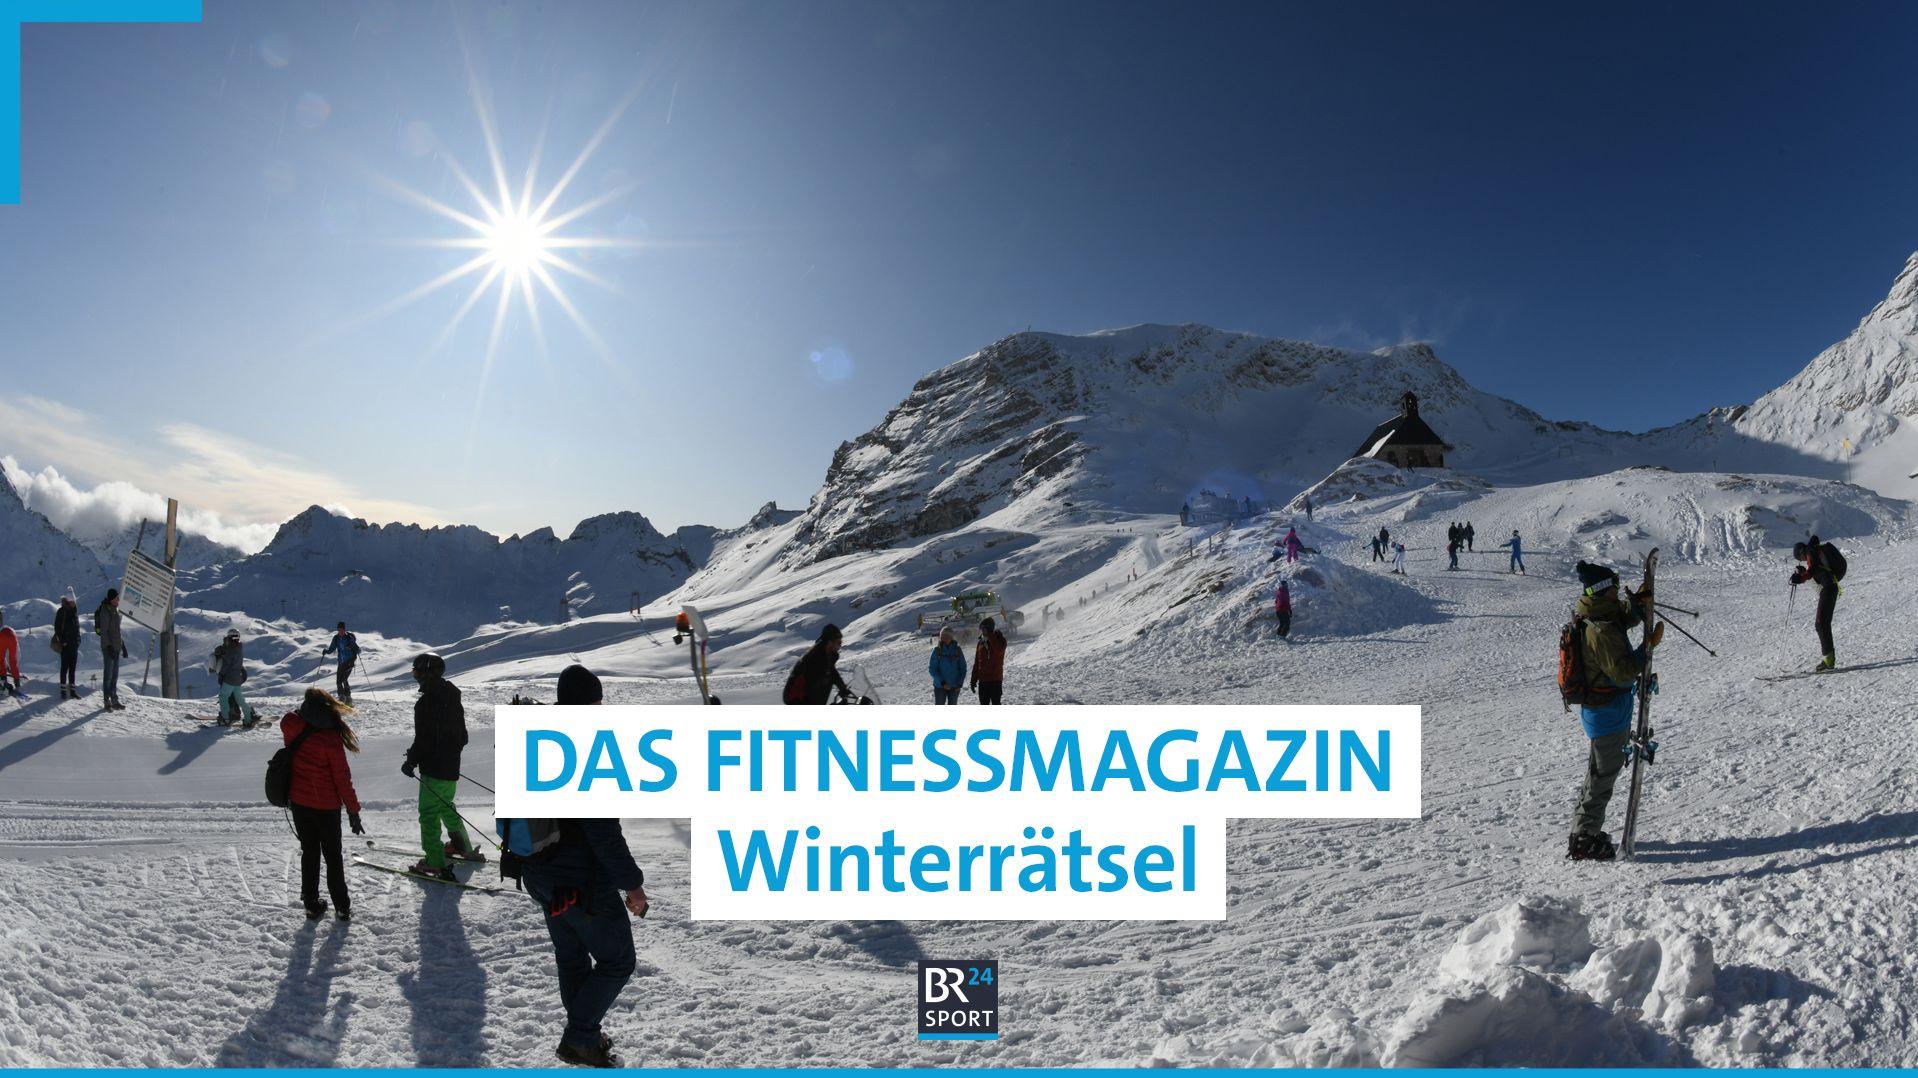 Das Fitnessmagazin-Winterrätsel